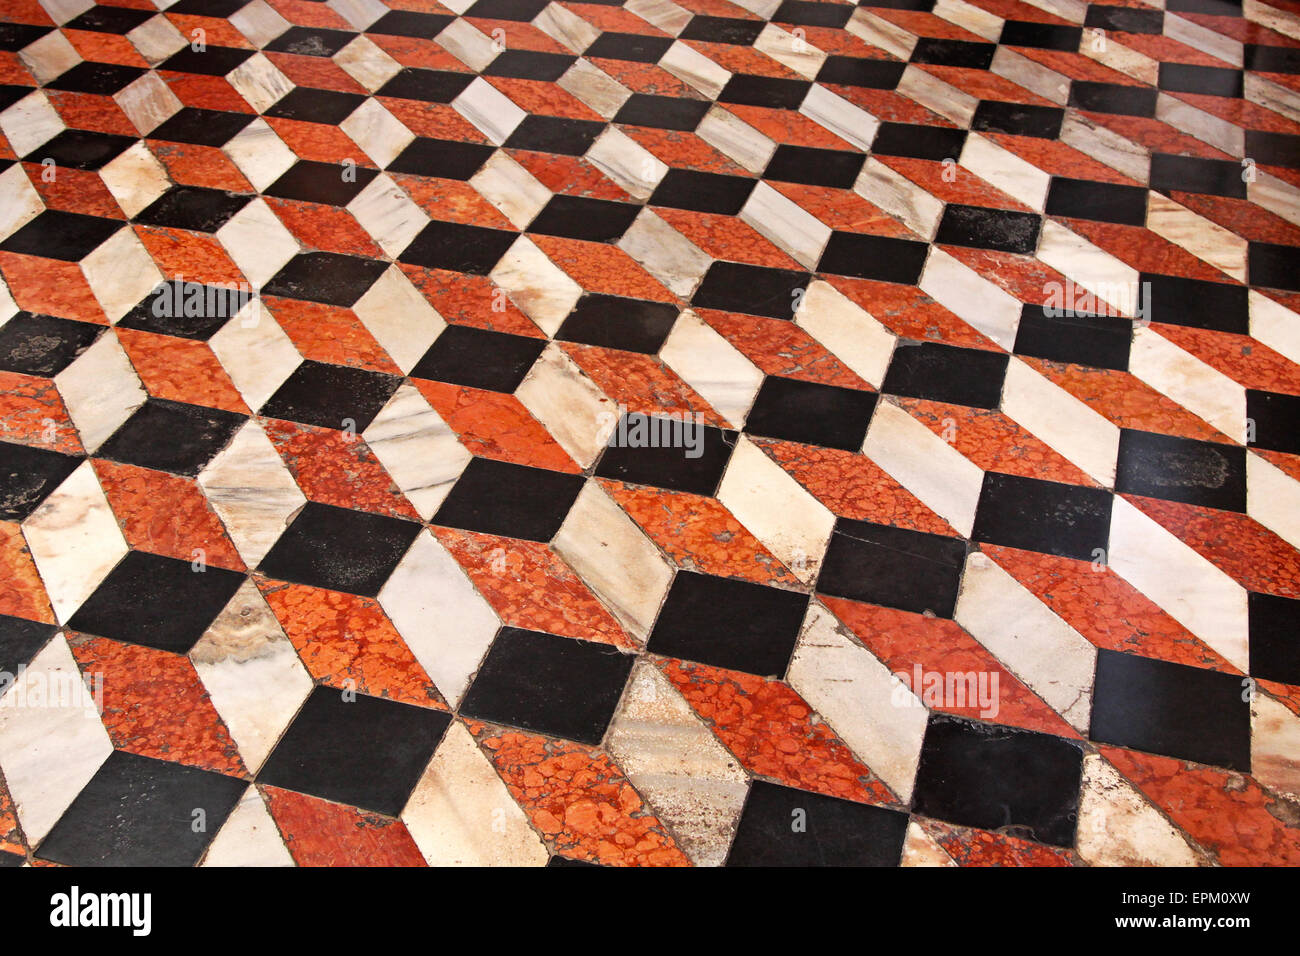 Fußboden Fliesen Wie ~ Wunderschöne ideen fußboden fliesen alle fliesen